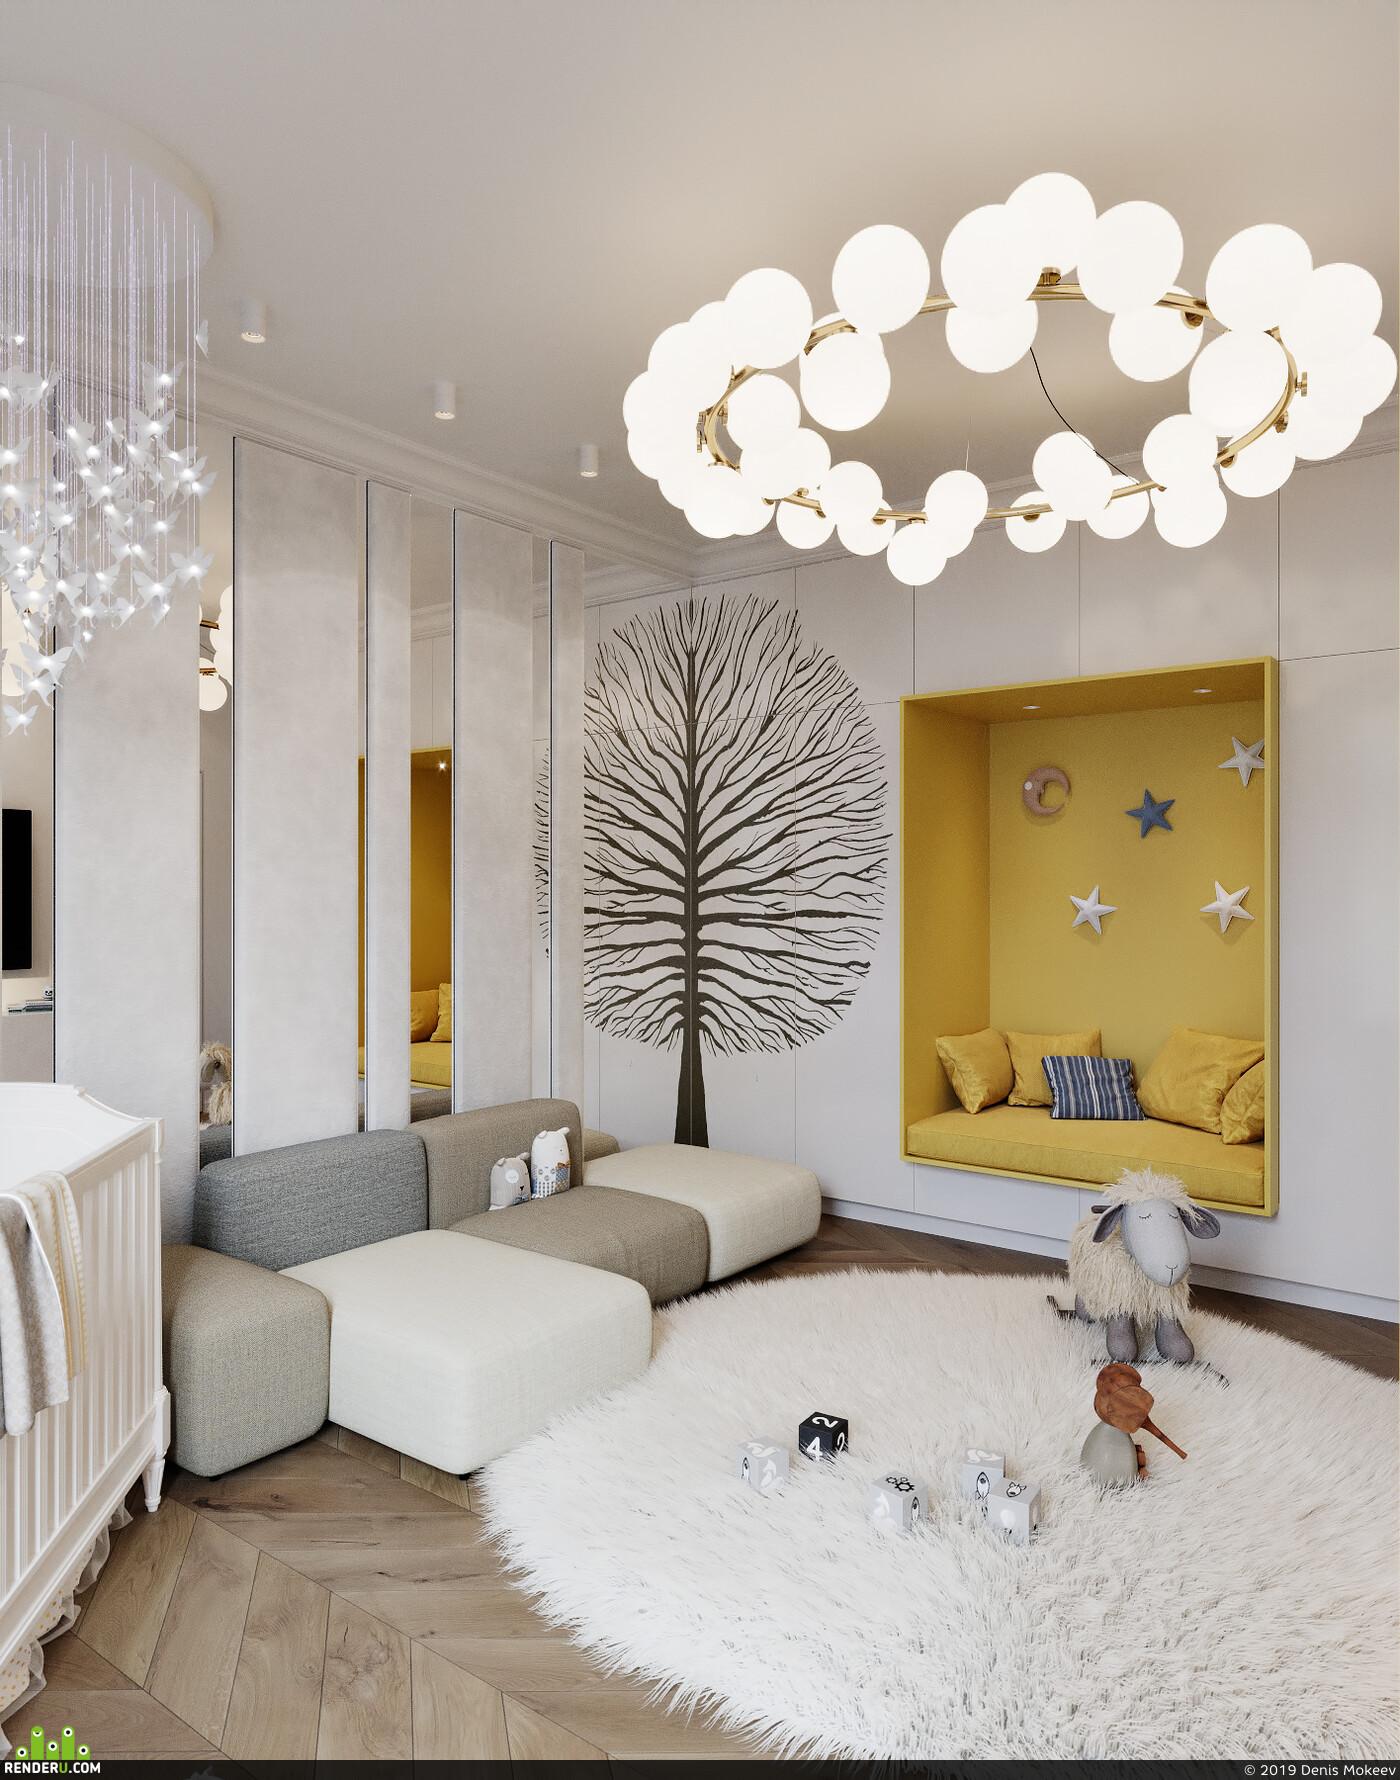 room, Children, bed, sofa, light, Soft, rug